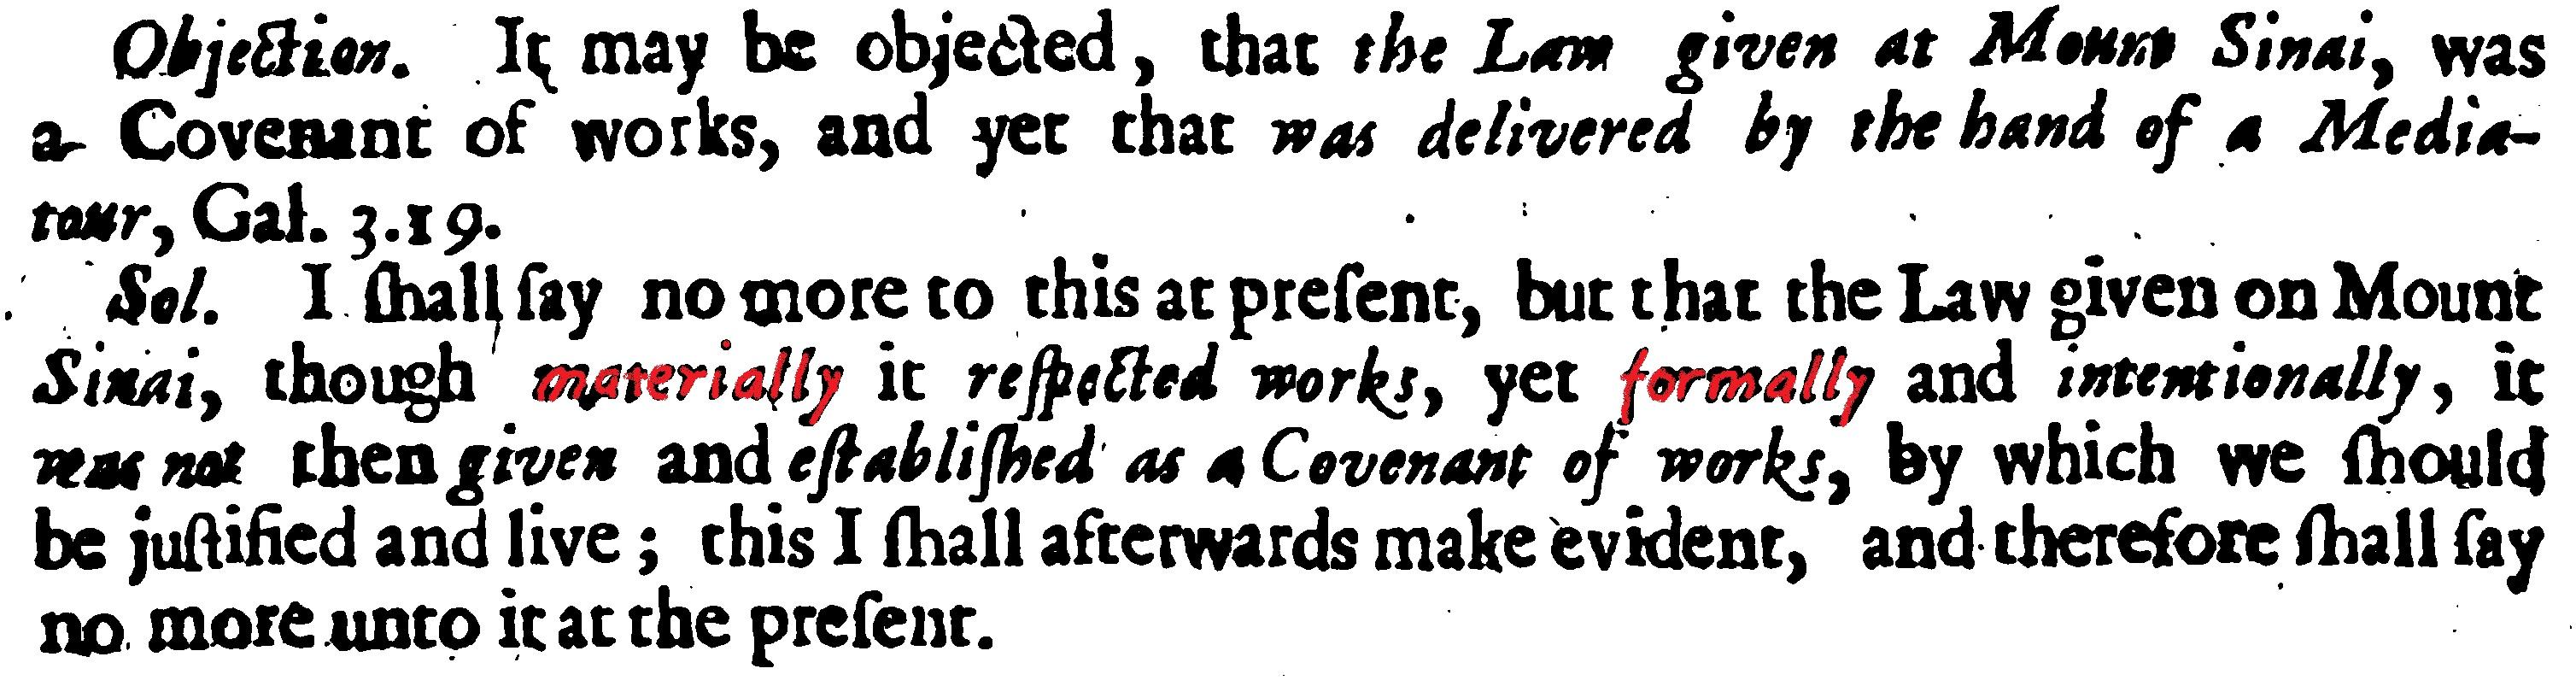 Obadiah Sedgwick, Bowels of Tender Mercy, 10